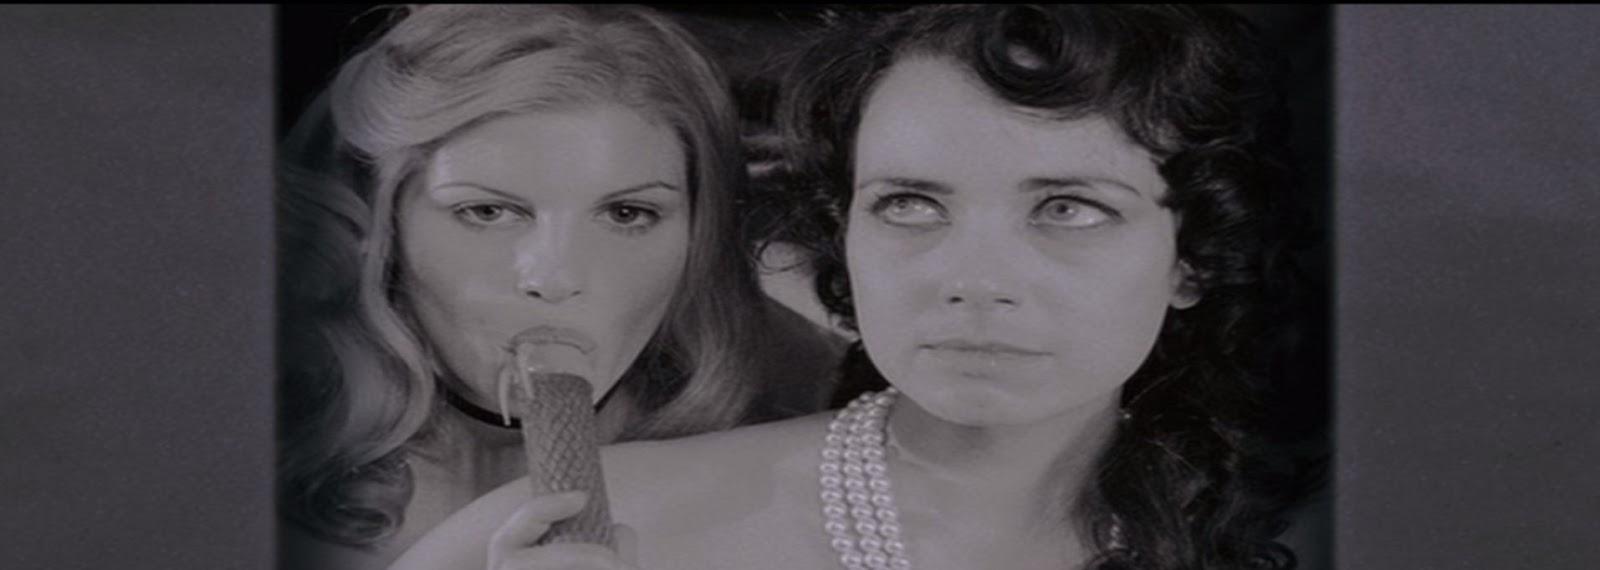 Black dahlia movie with lucie arnaz 1